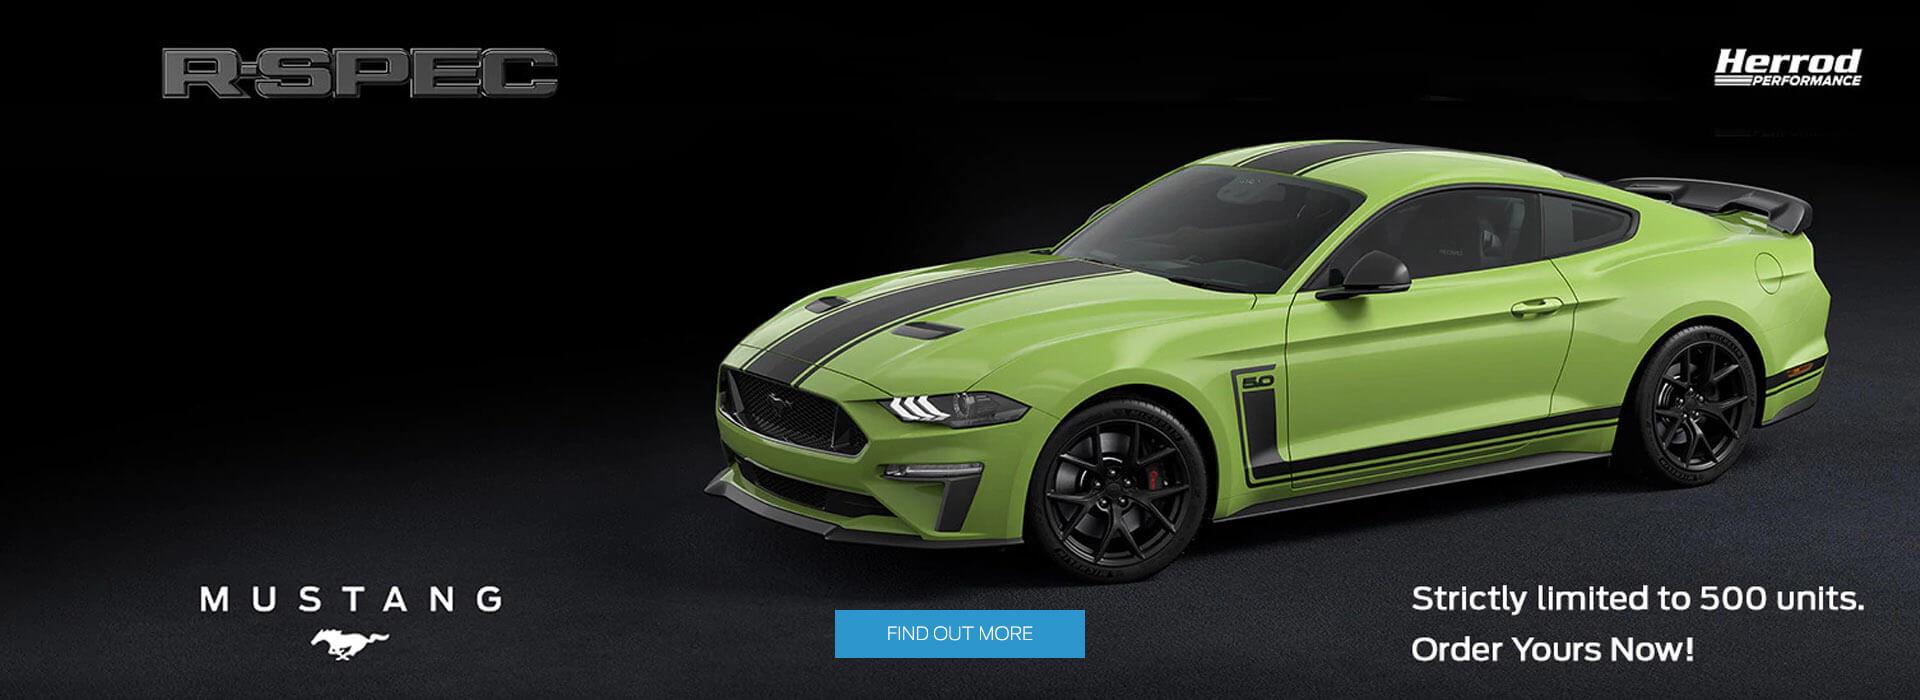 Gateway Ford Mustang R-SPEC